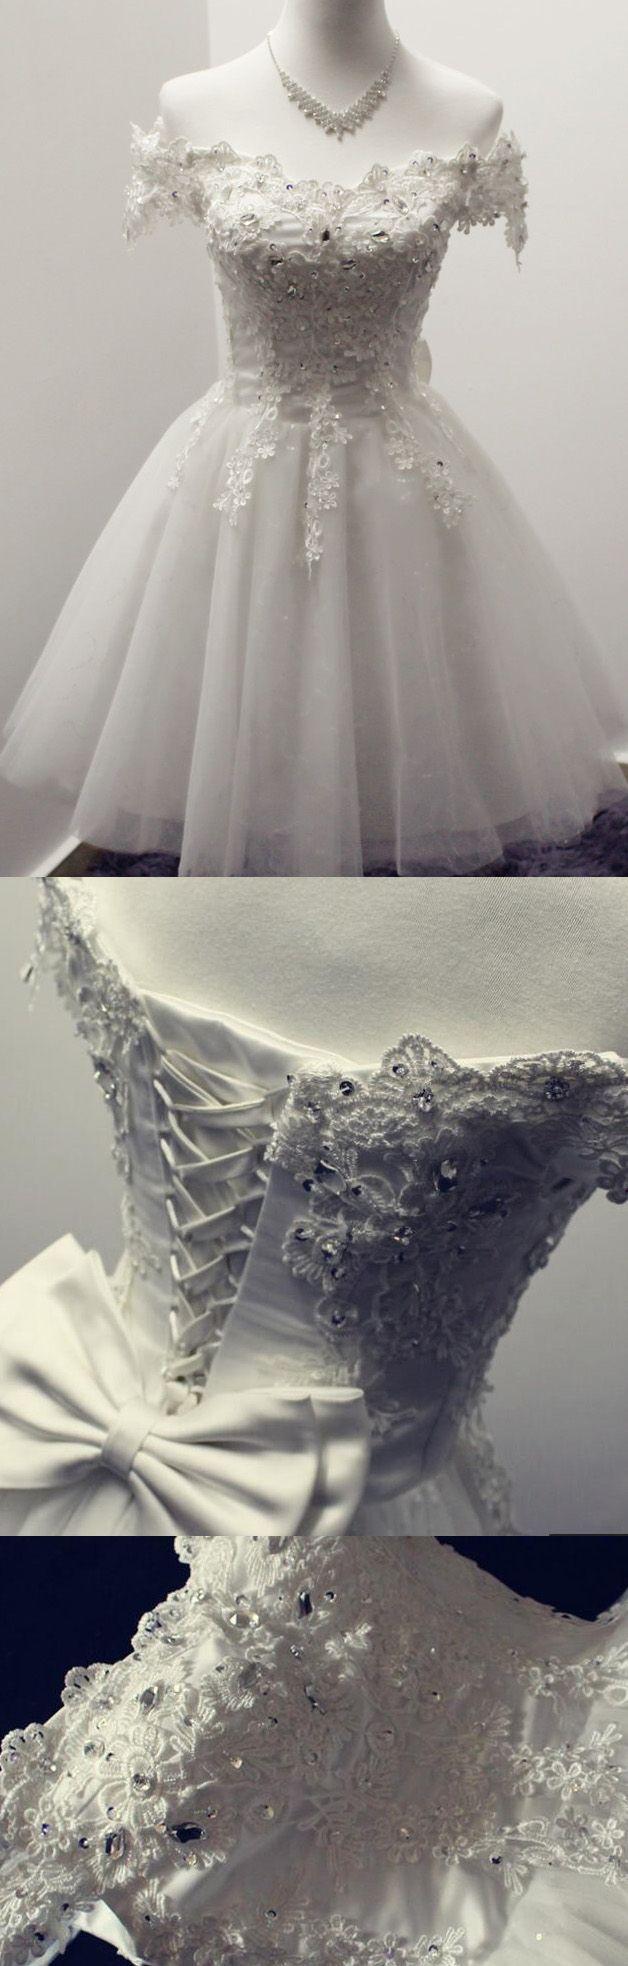 best fashion u jewelries images on pinterest sweet dress fairy